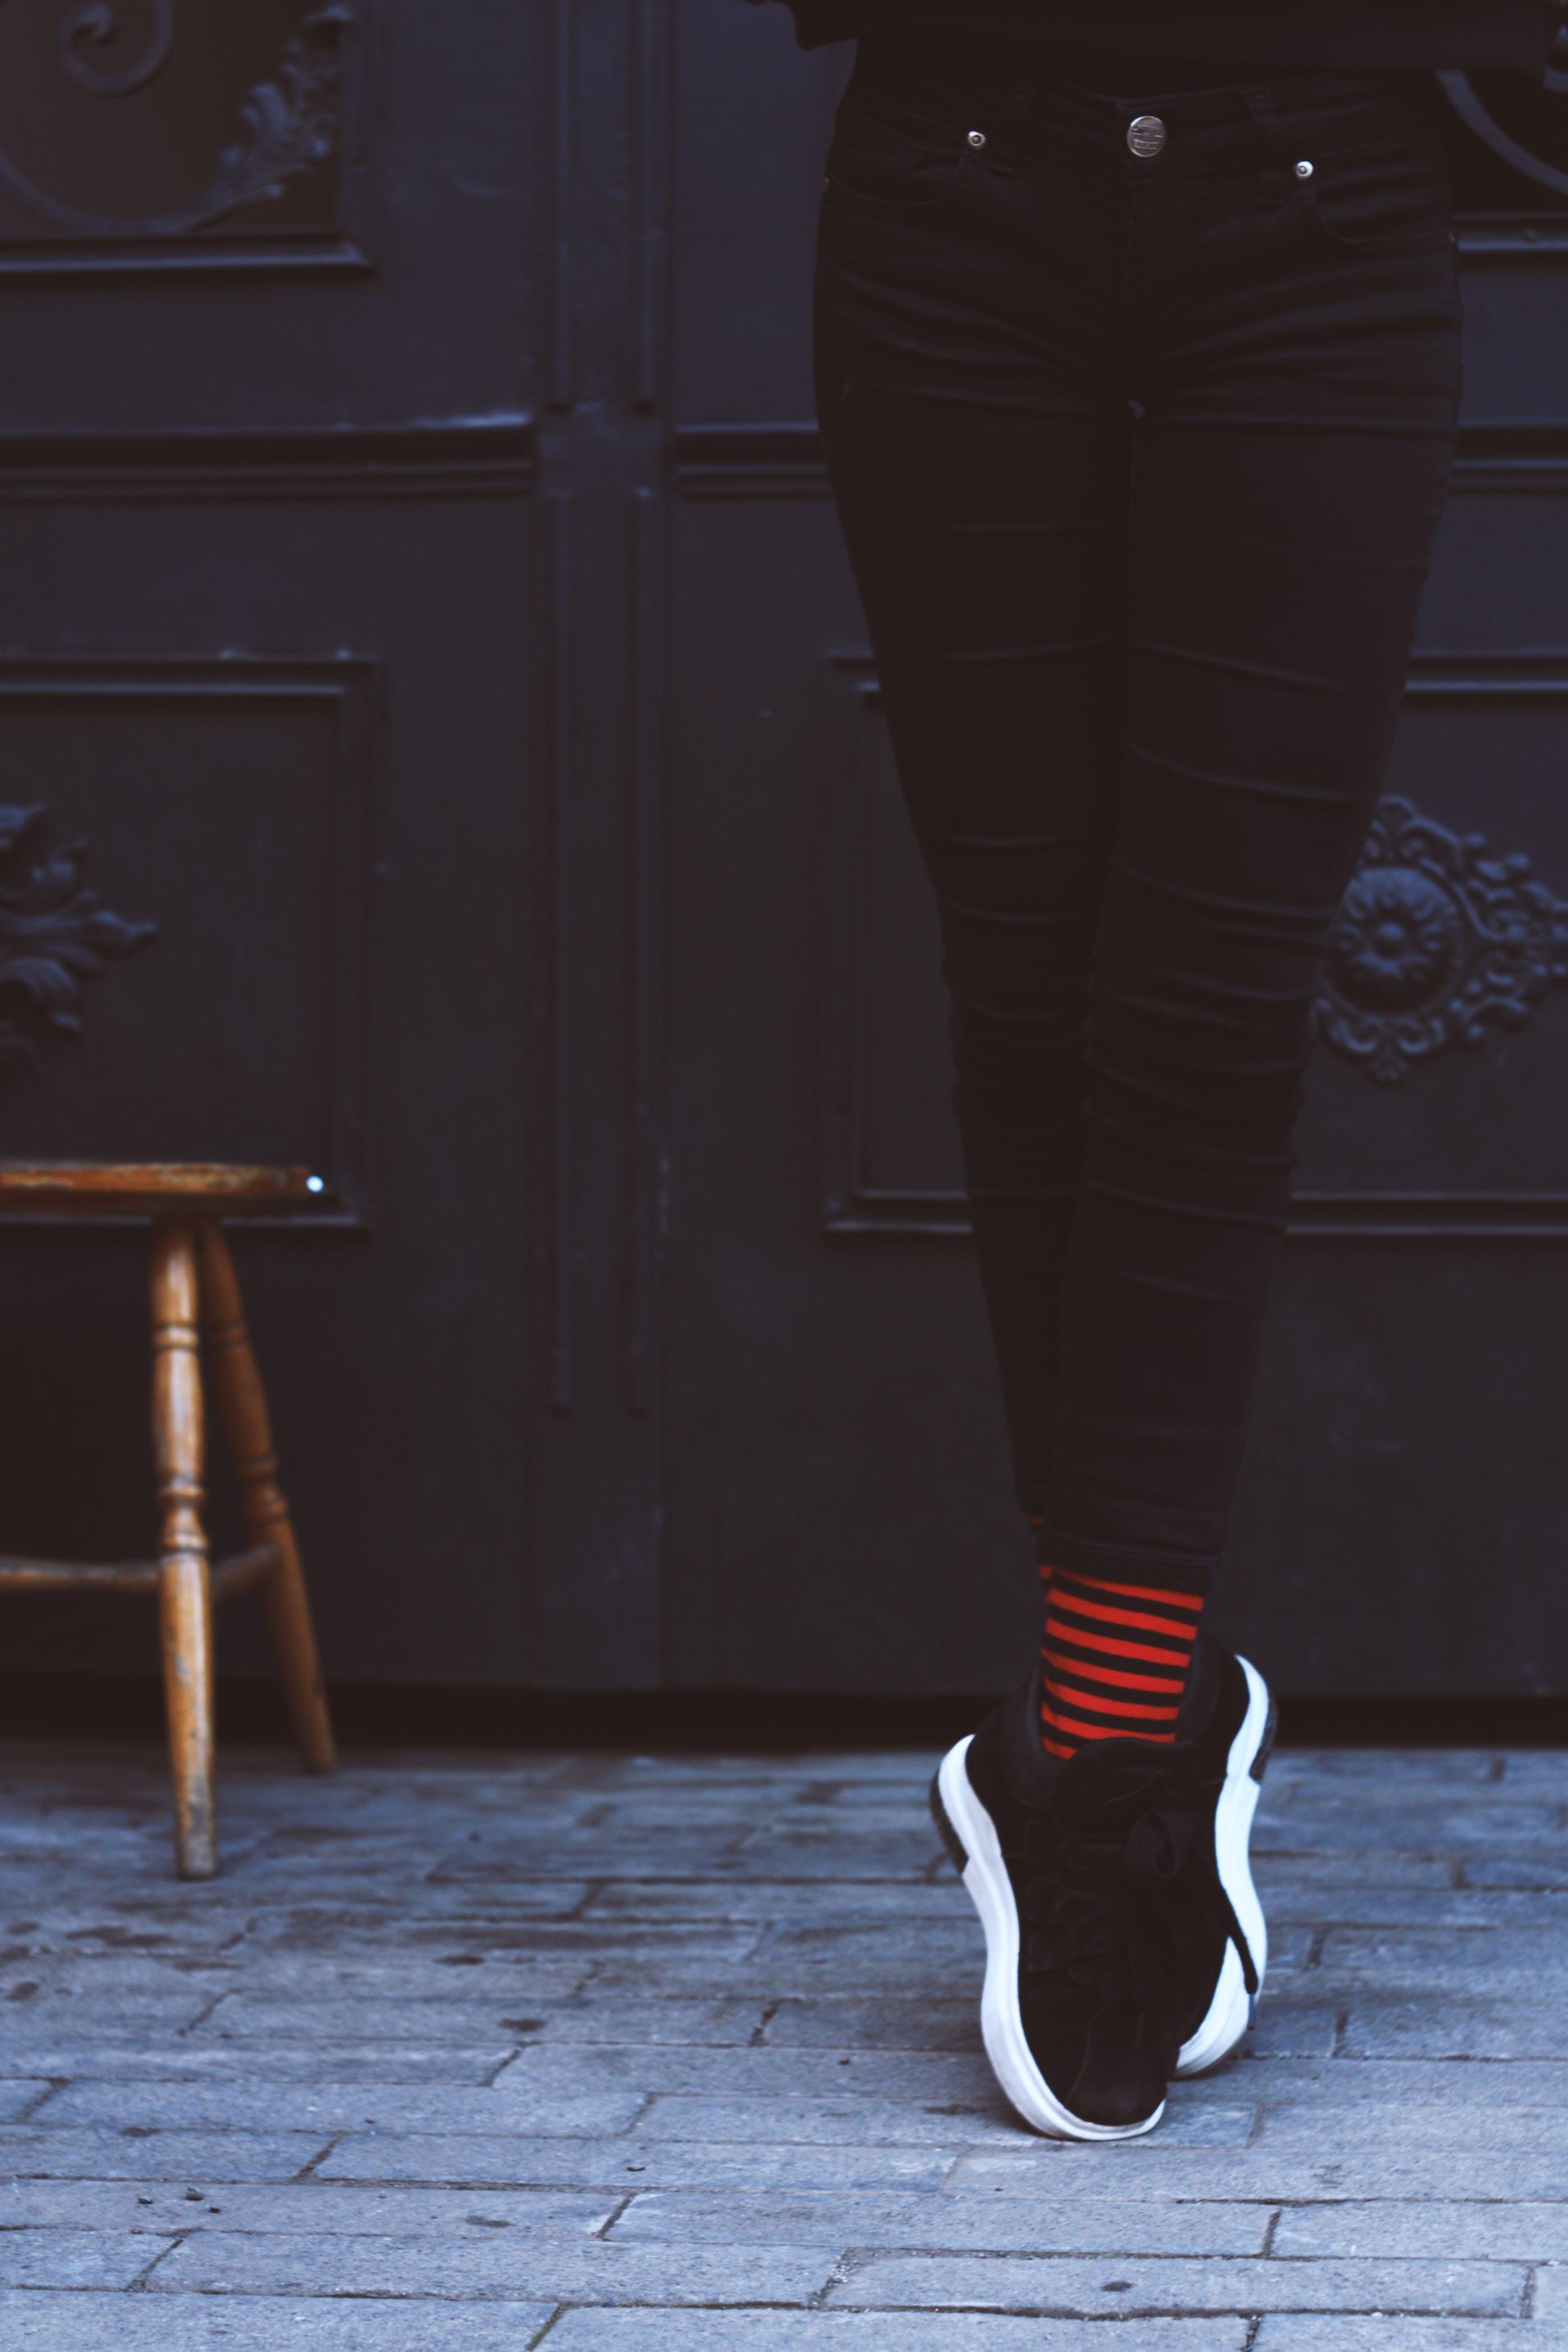 Ben, fodtøj, gade